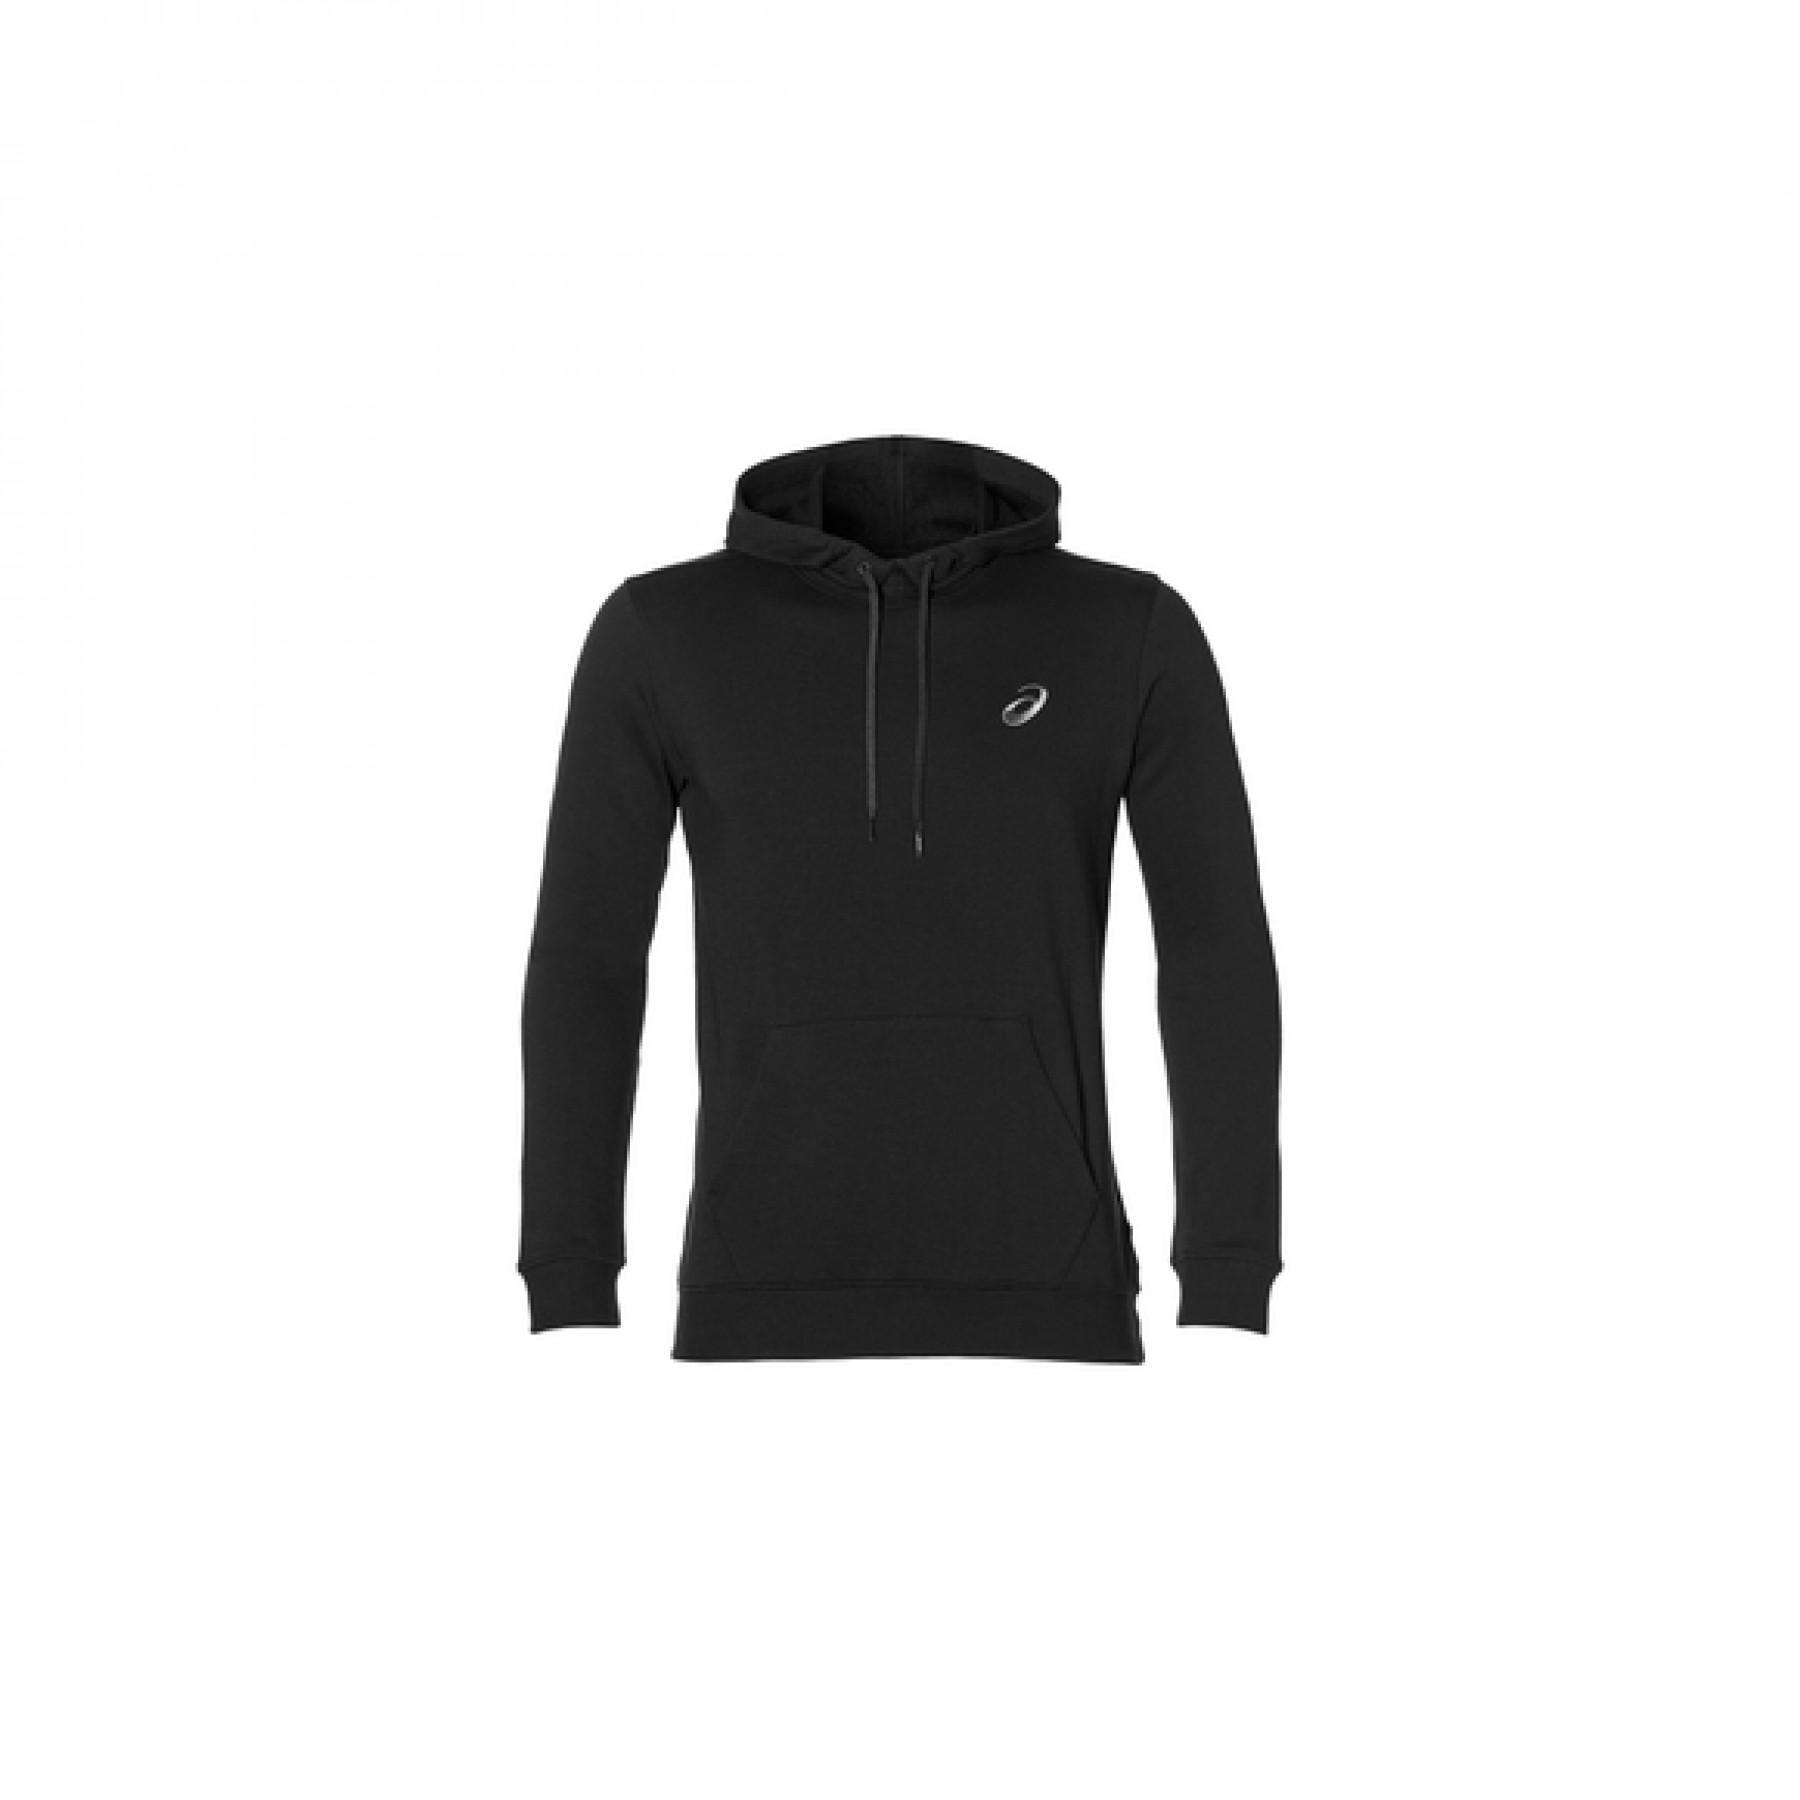 Hoodie Asics chest logo oth hoodie